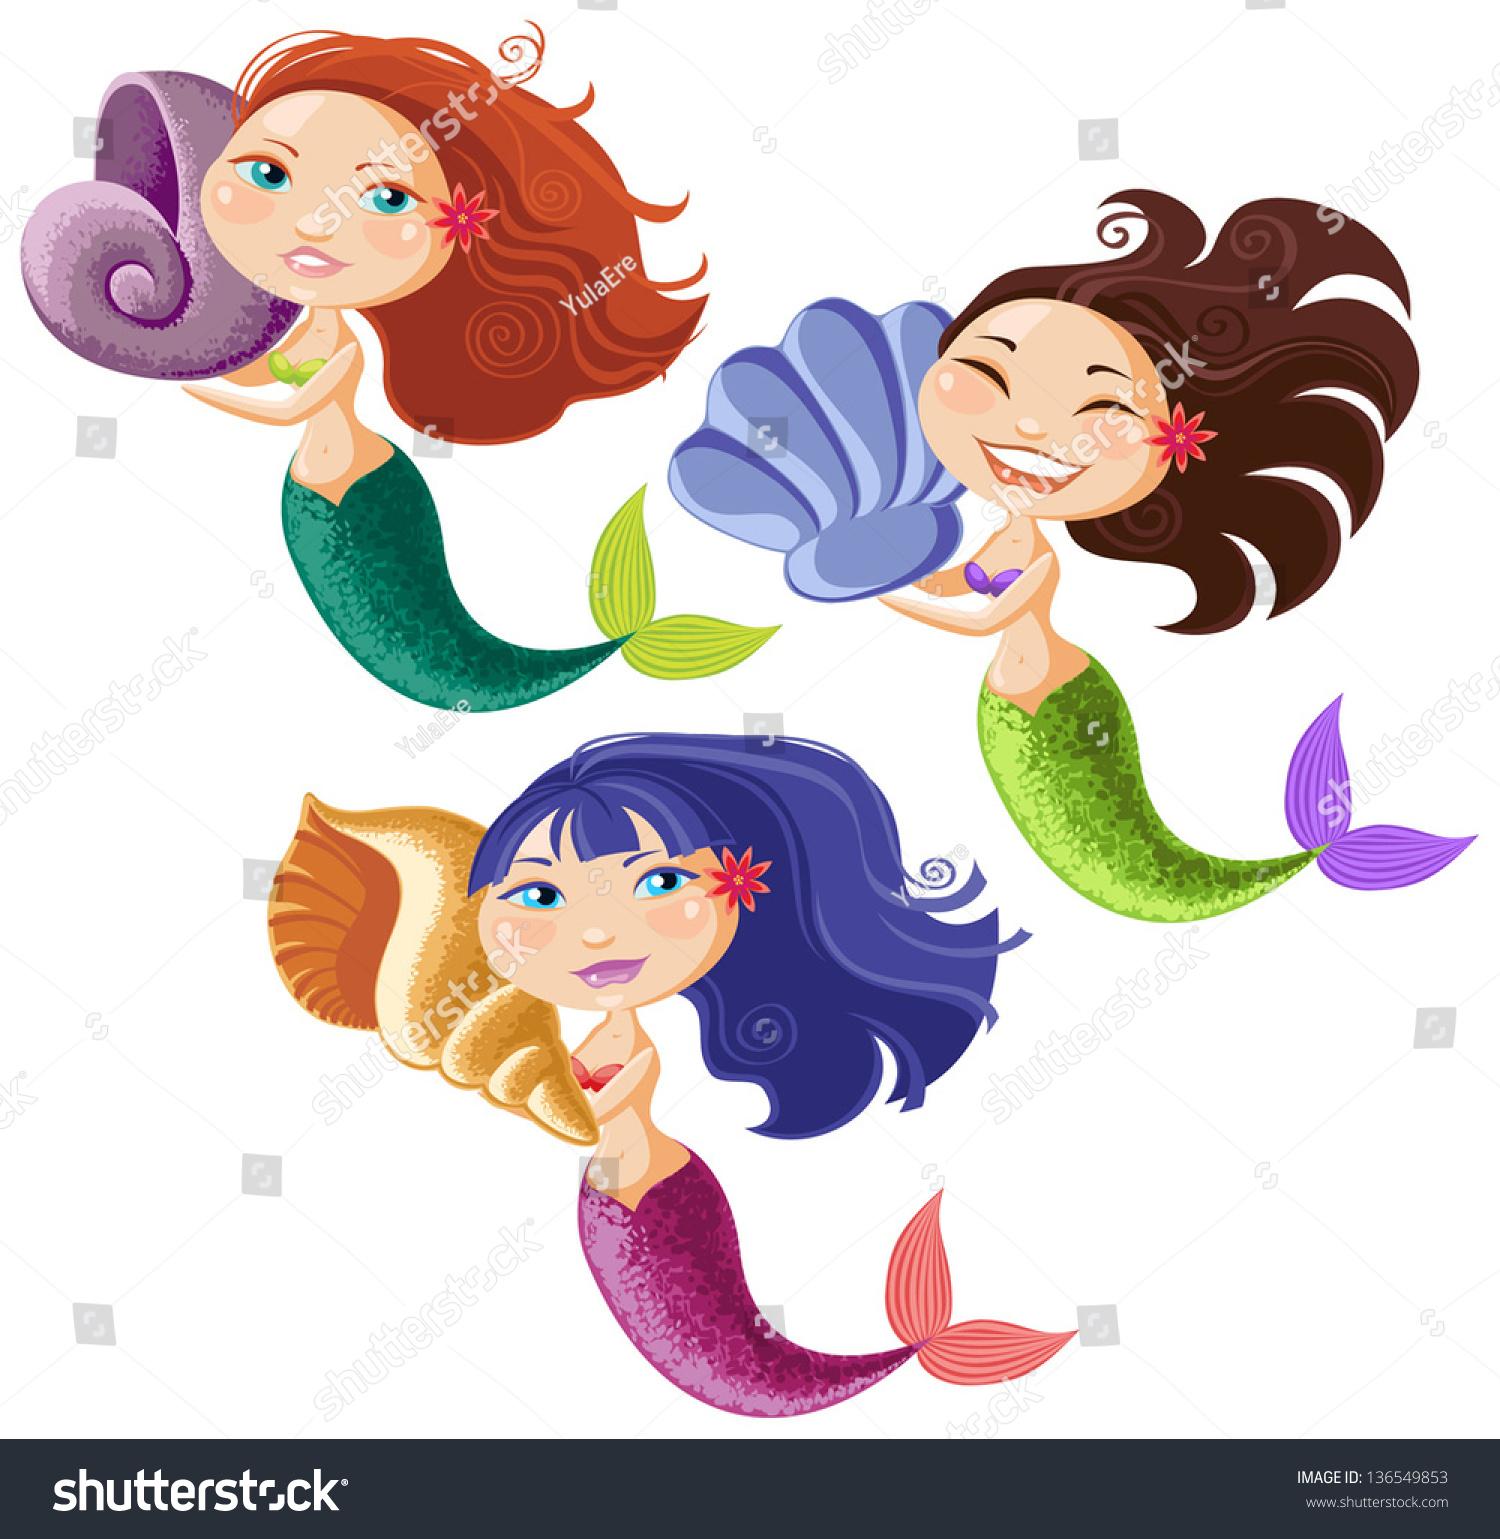 Animated Pictures Of Seashells funny cartoon mermaids seashells stock vector (royalty free